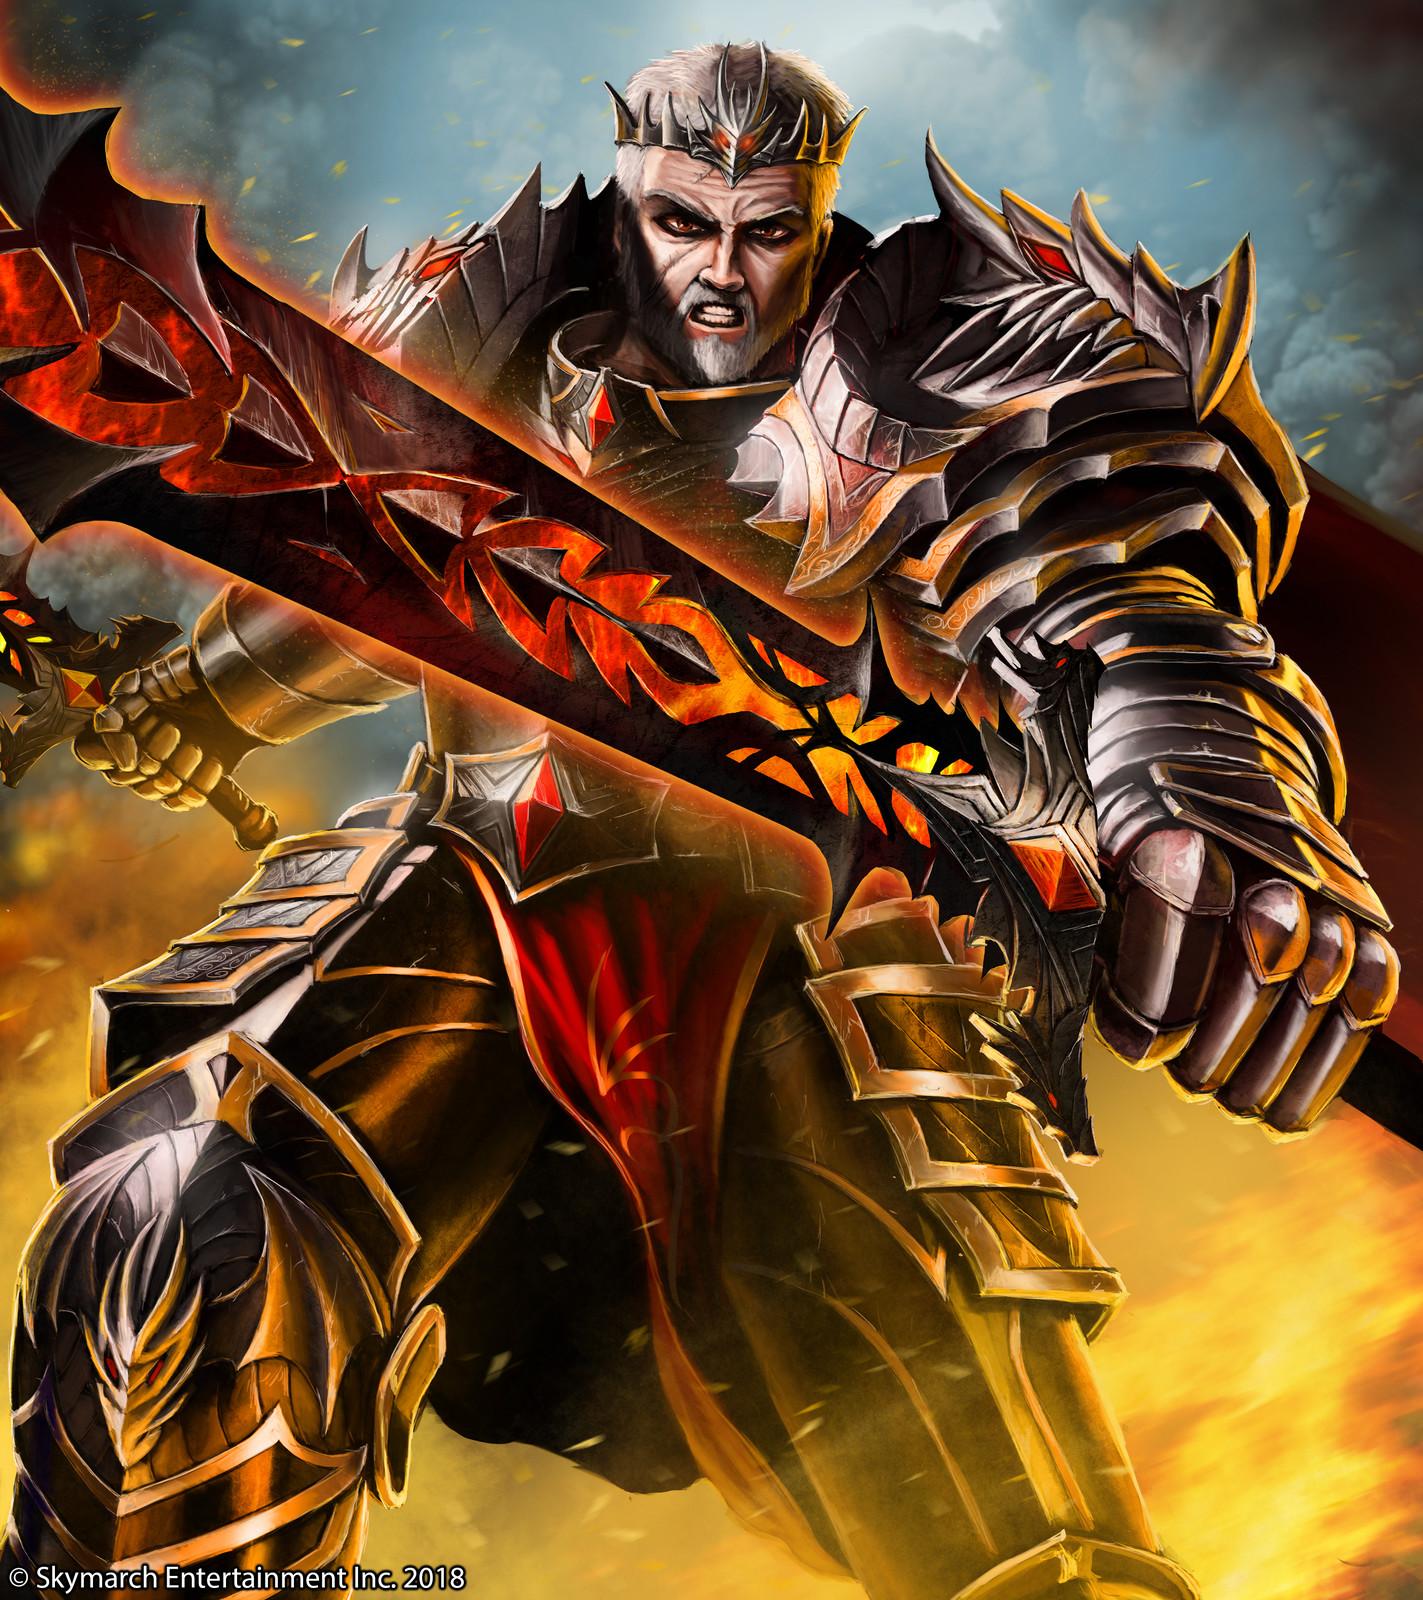 Davarok, the mad king